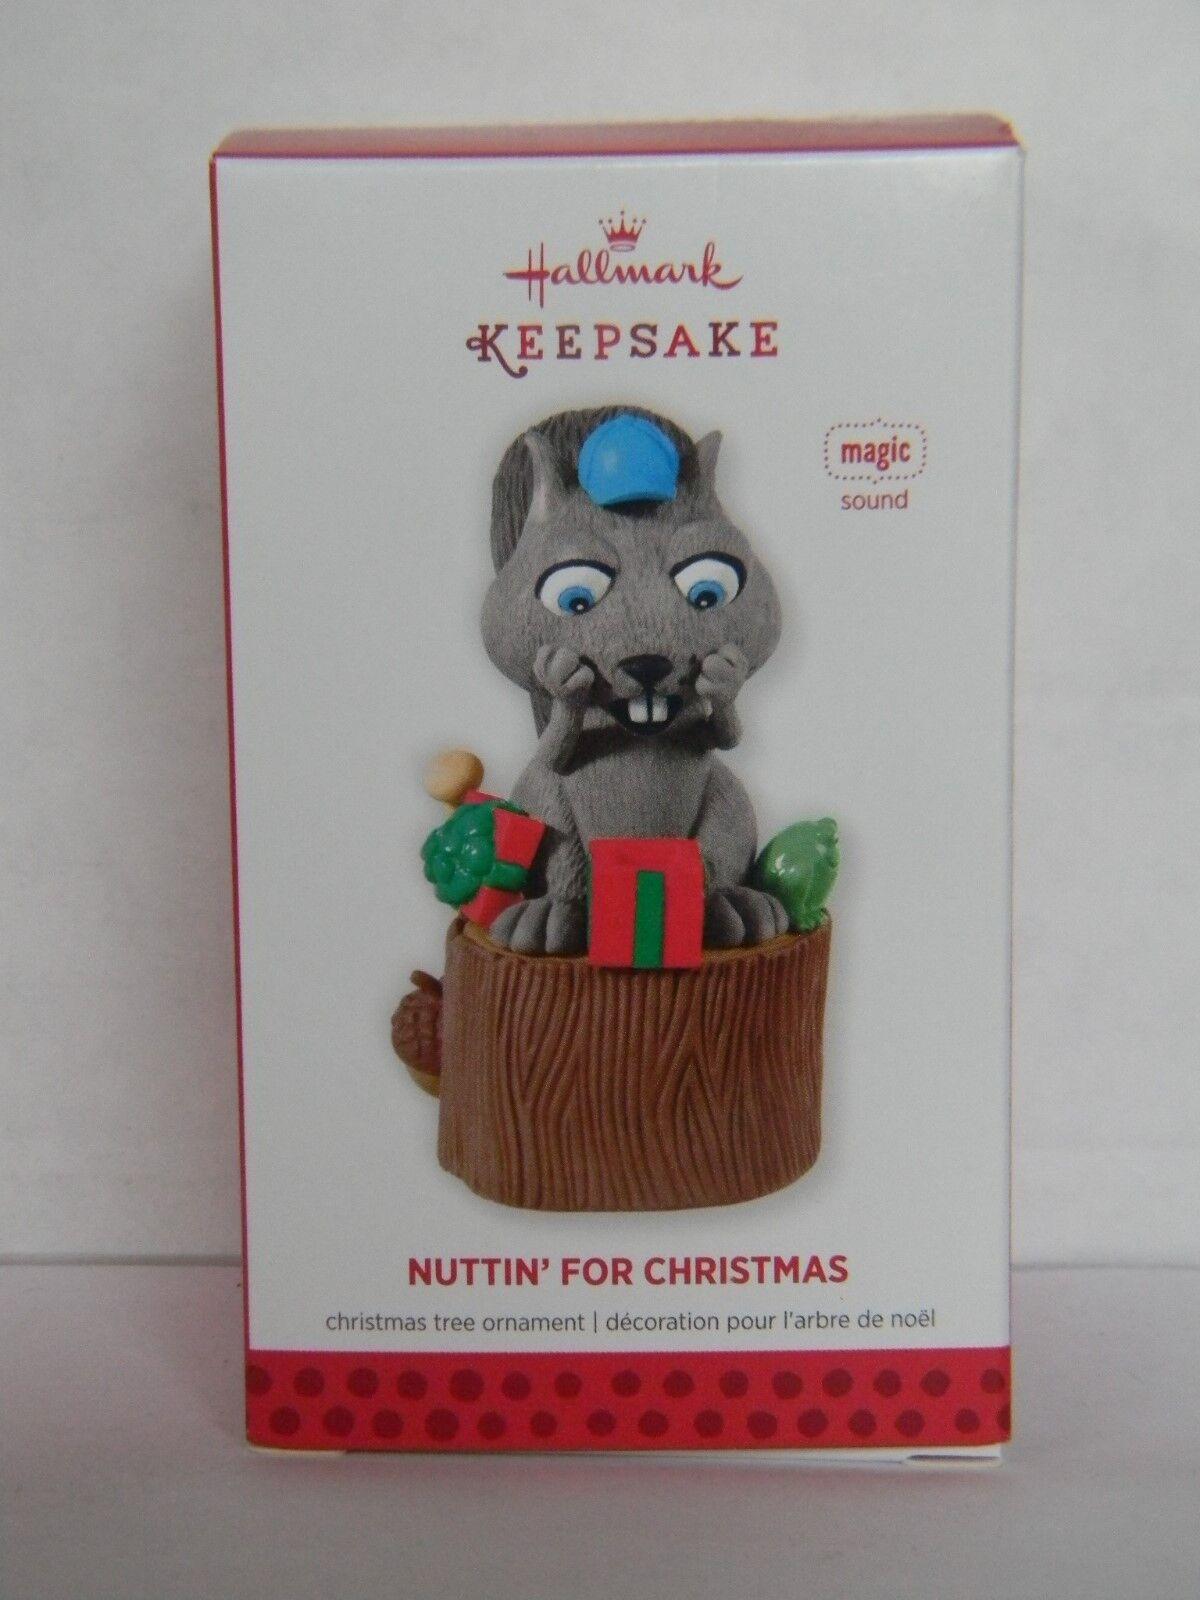 Nuttin for Christmas Hallmark 2013 Squirrel Magic Sound Ornament | eBay